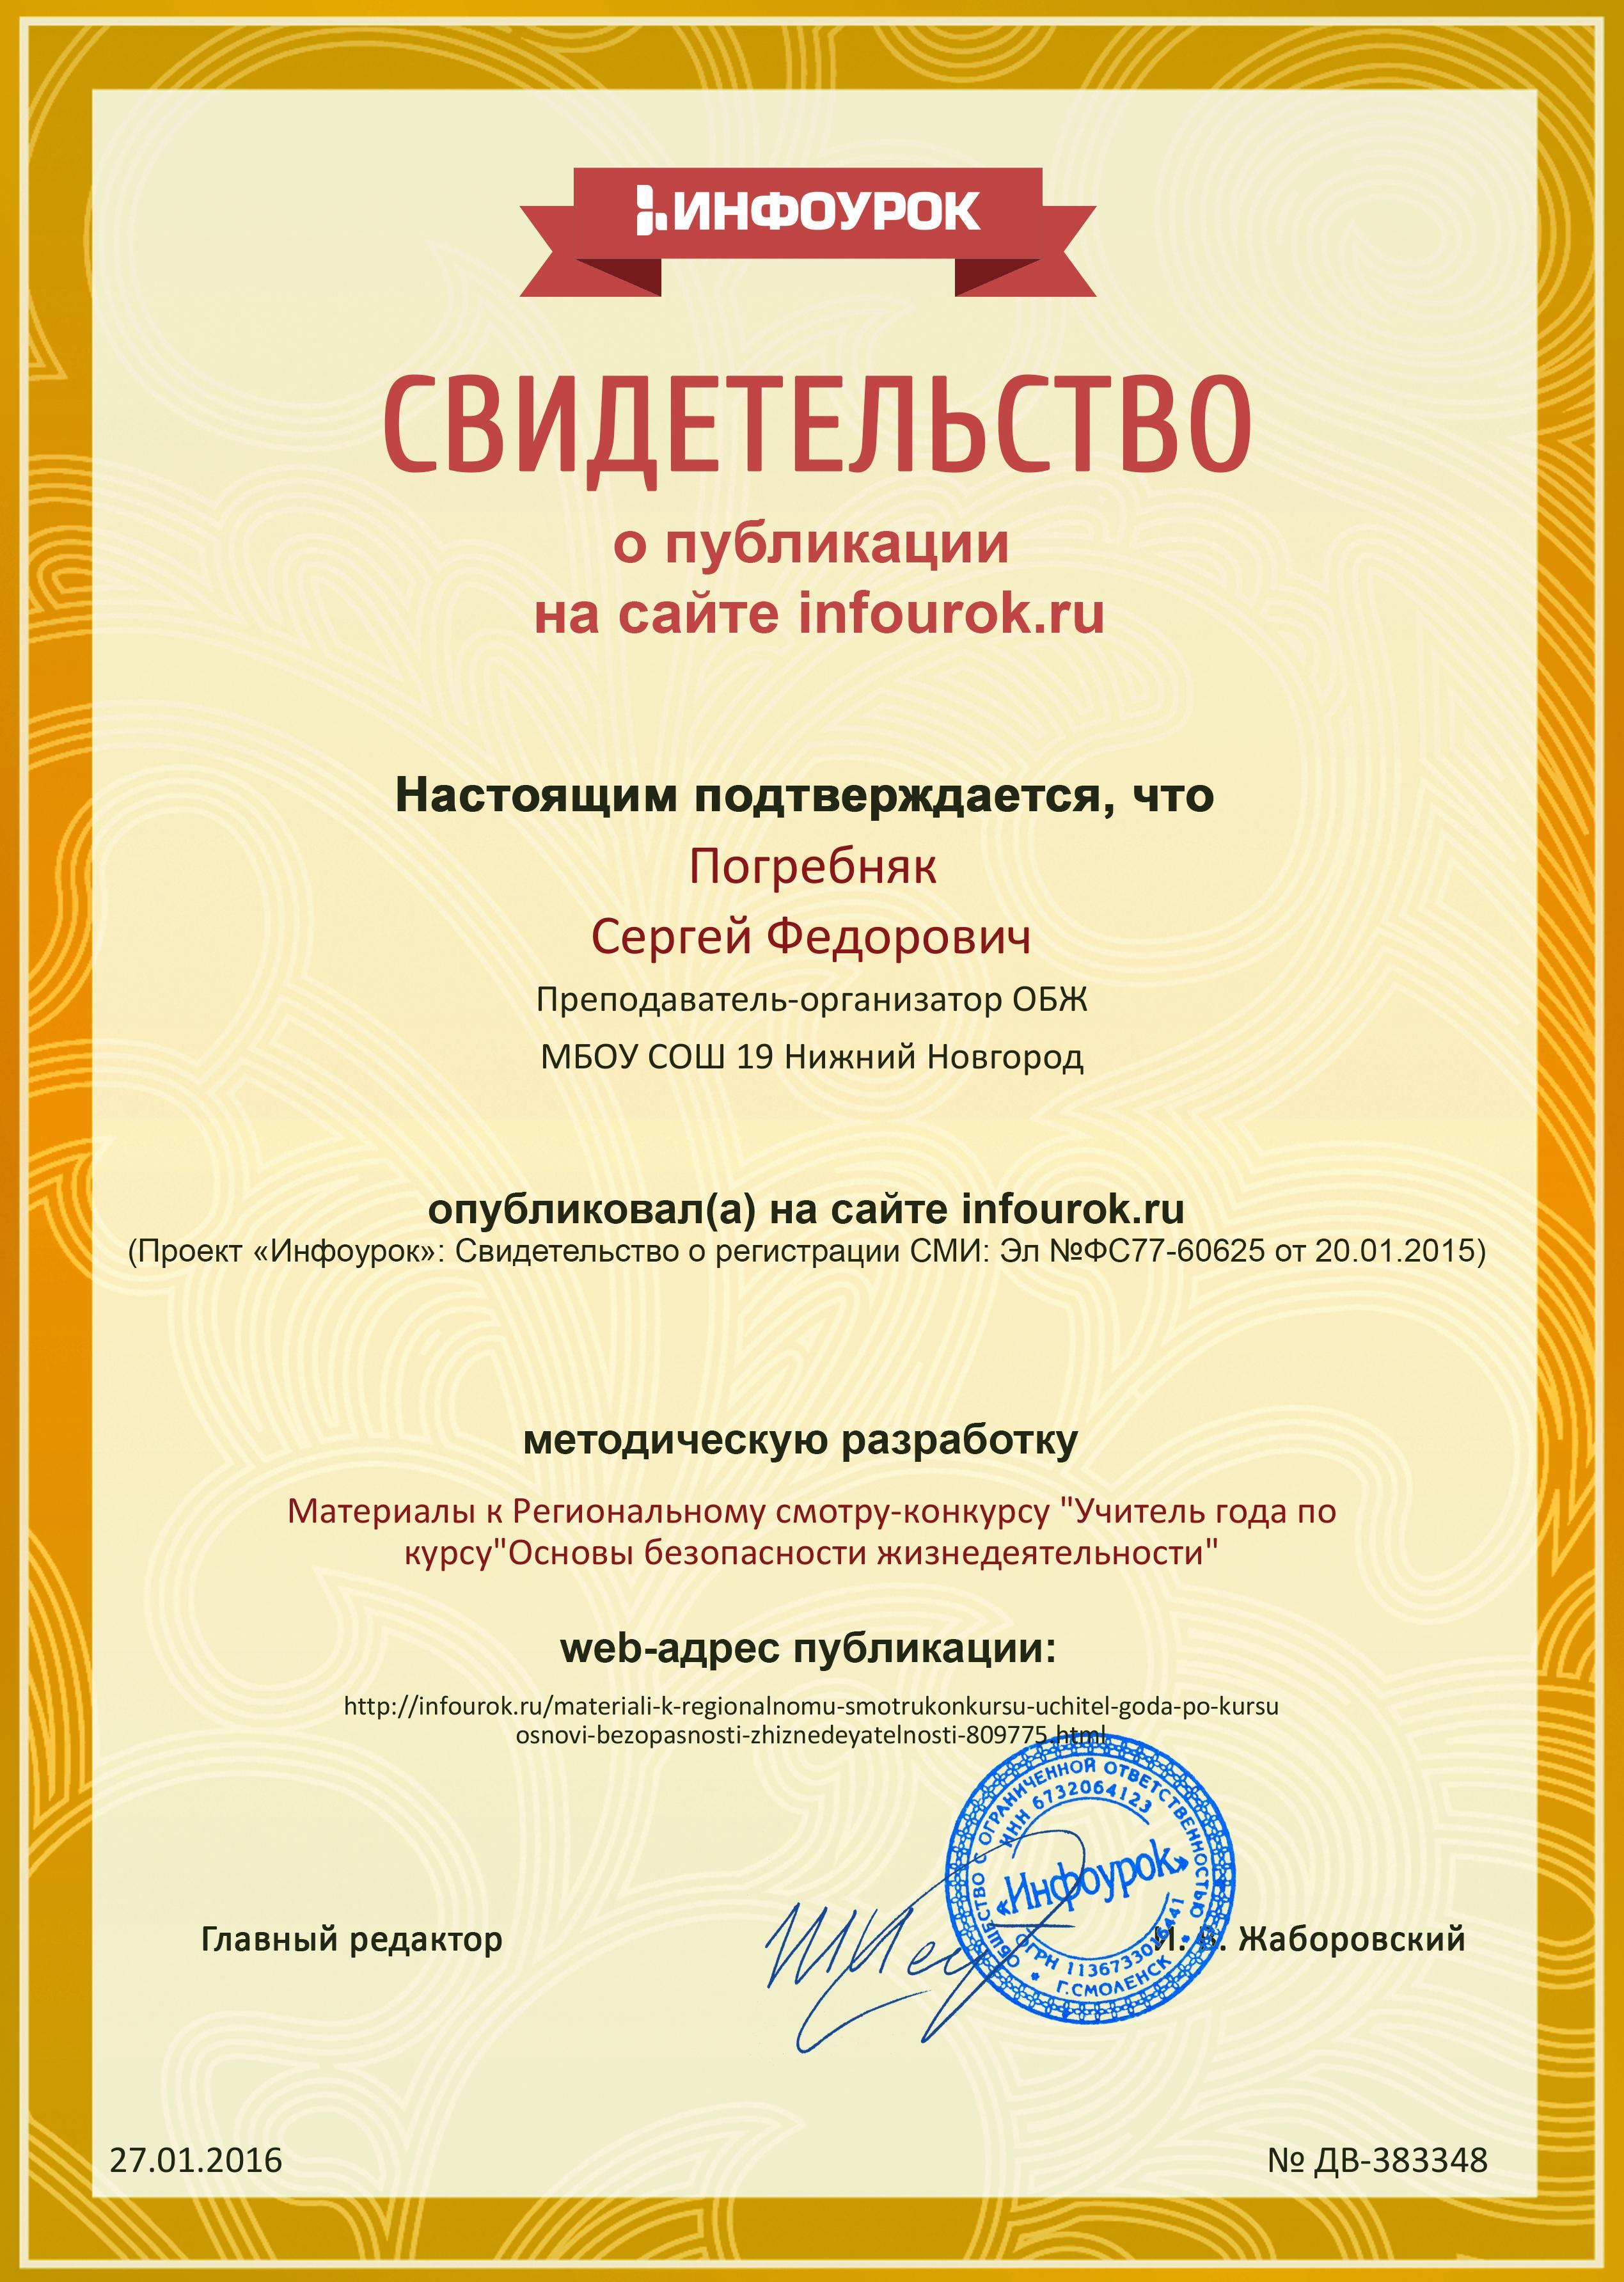 Сертификат проекта infourok.ru № ДВ-383348.jpg